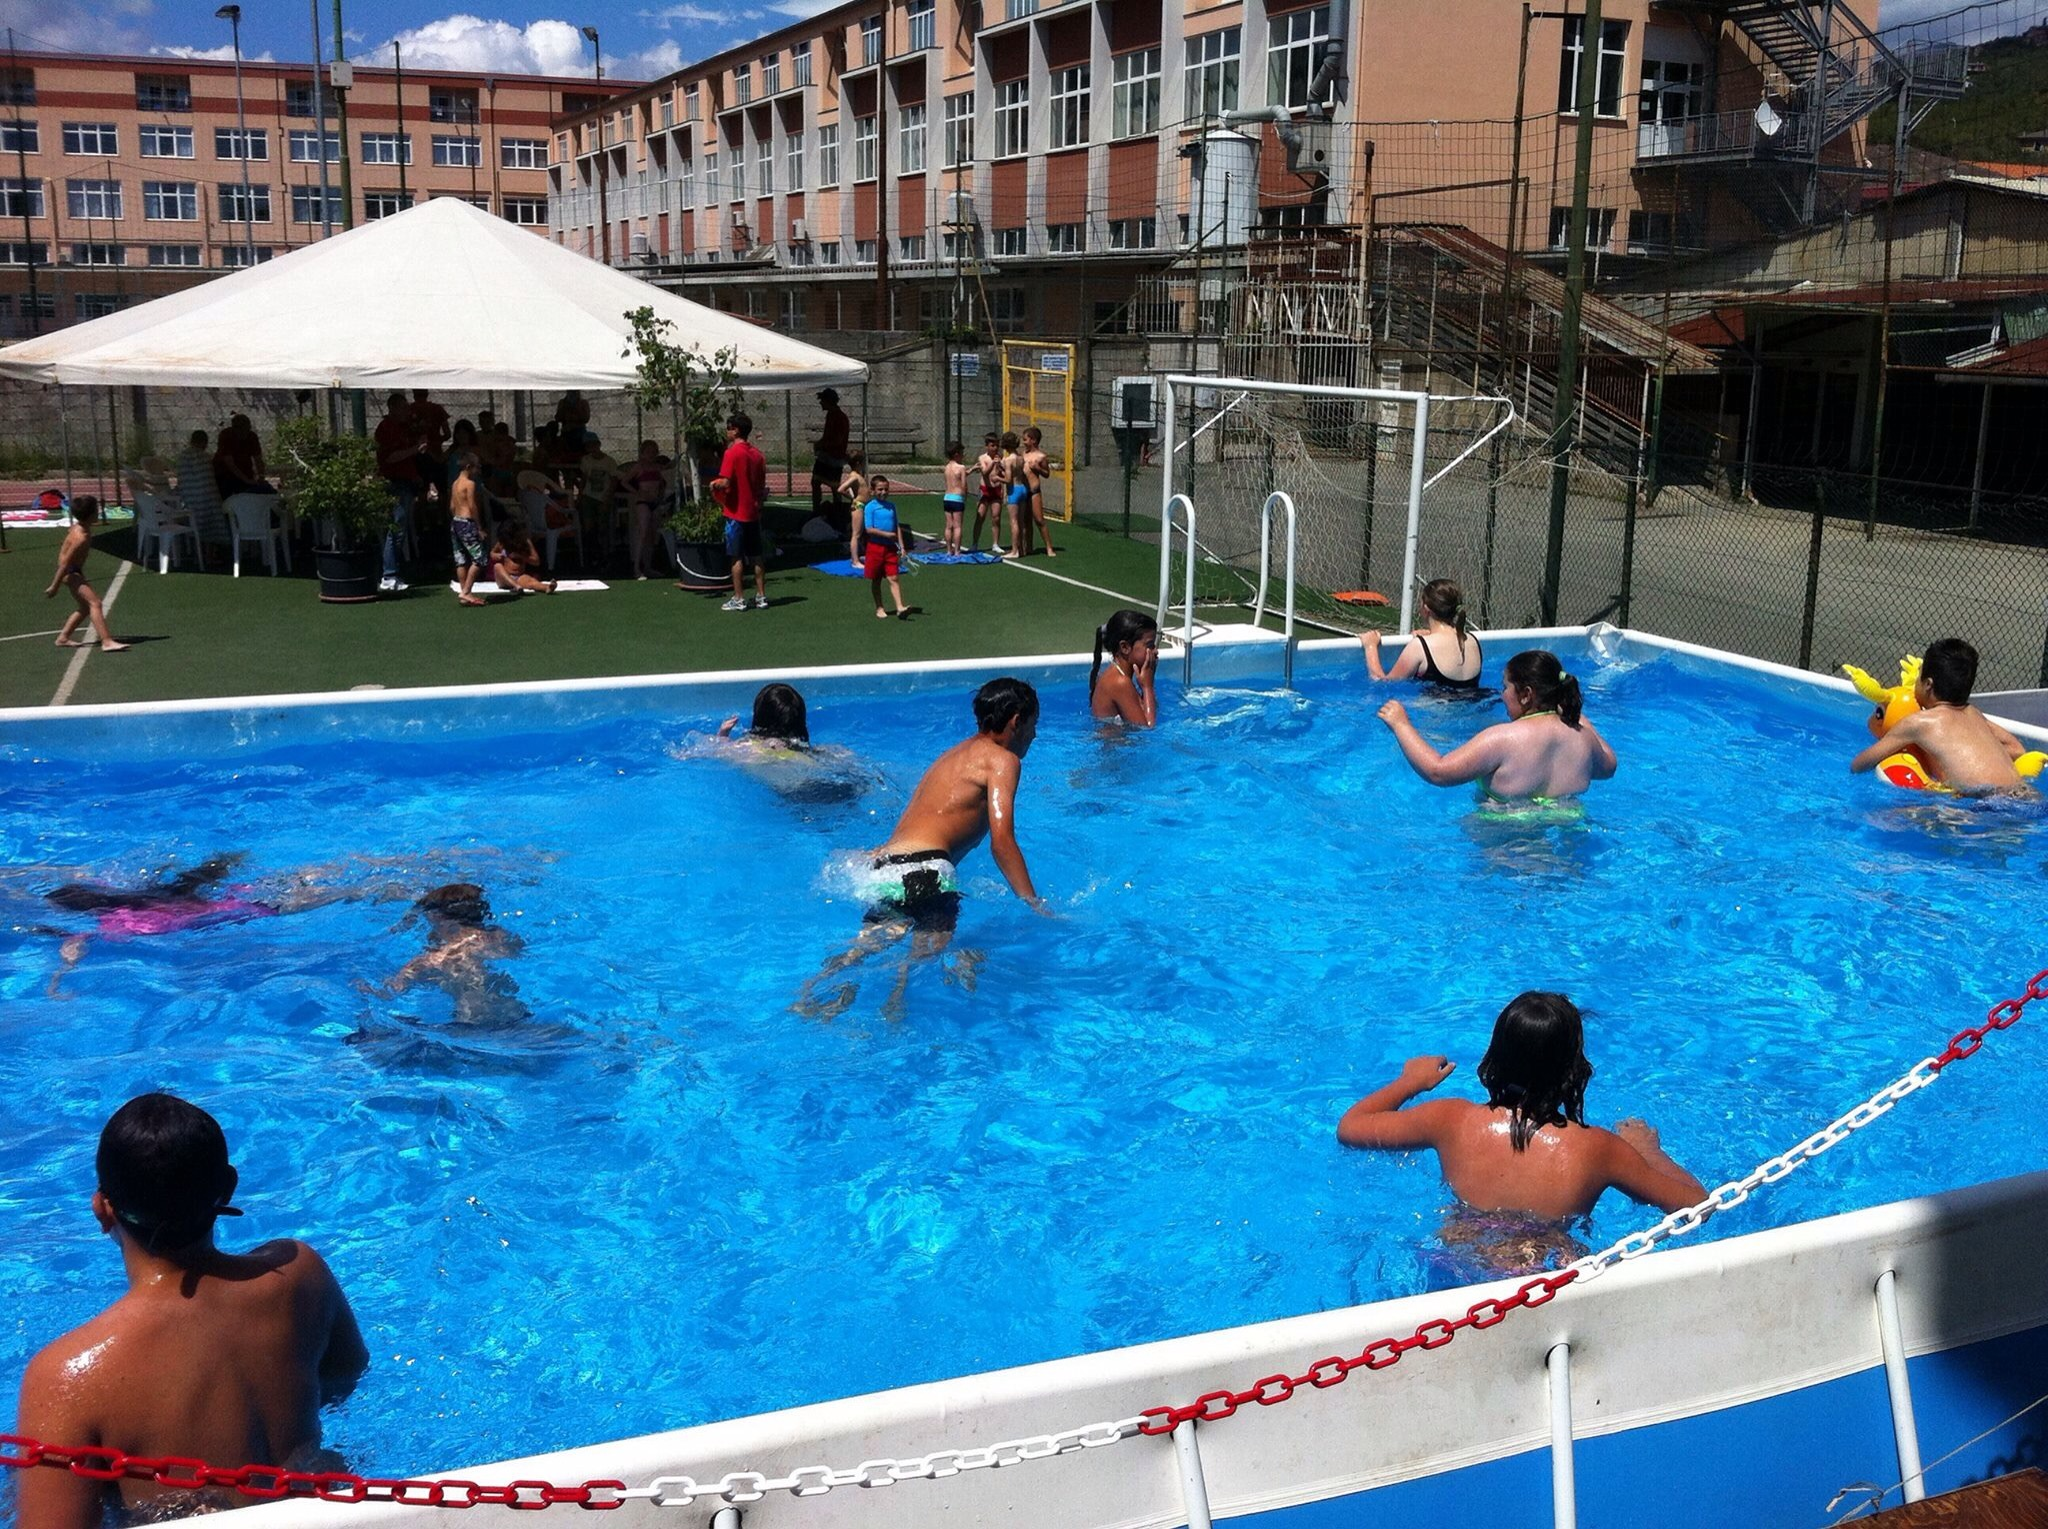 Piscina estate Centro San Salvatore Giochinsieme